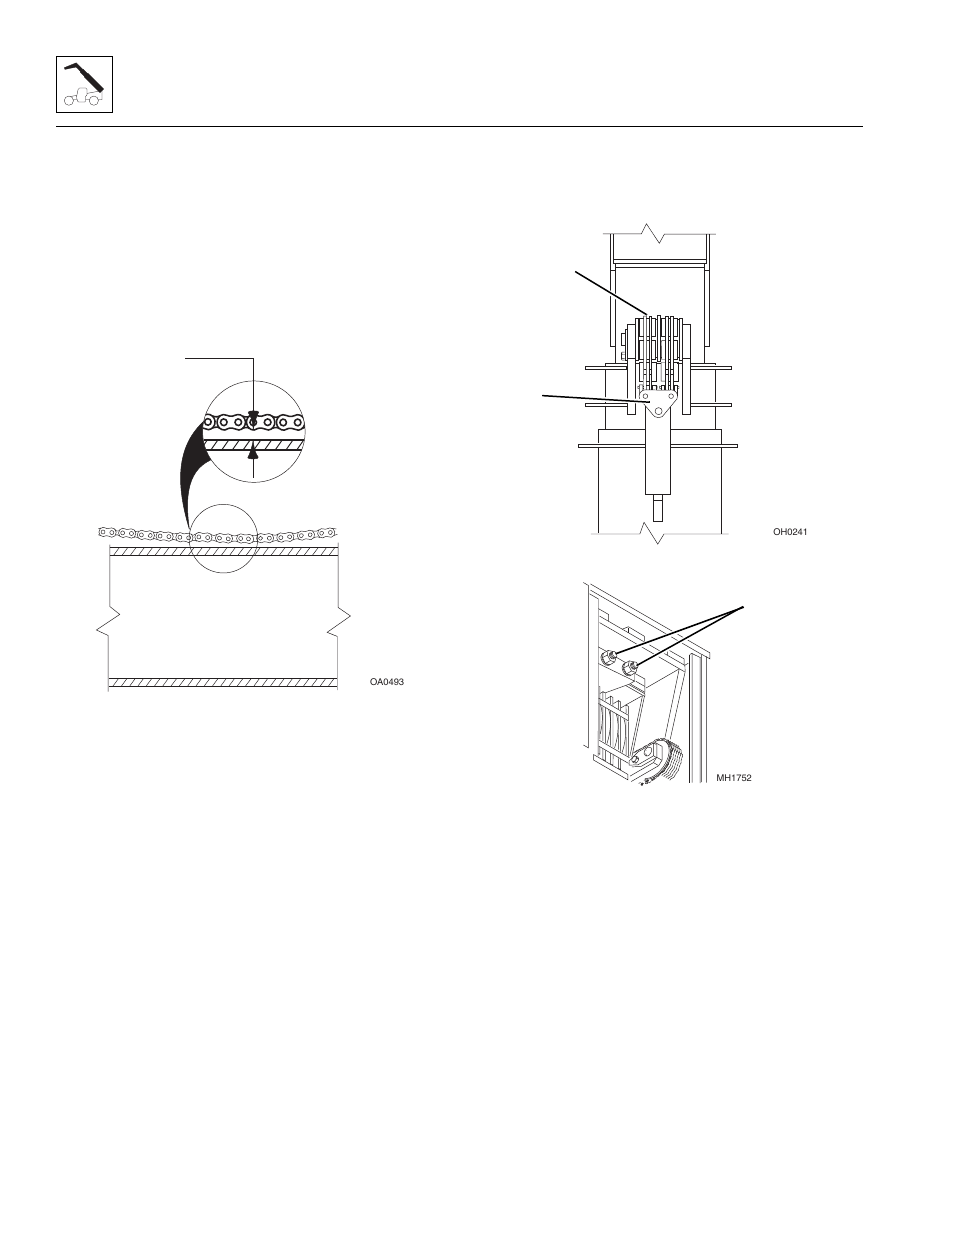 medium resolution of boom chain diagram wiring diagram schematics gold chain 5 boom chain tension check boom chain